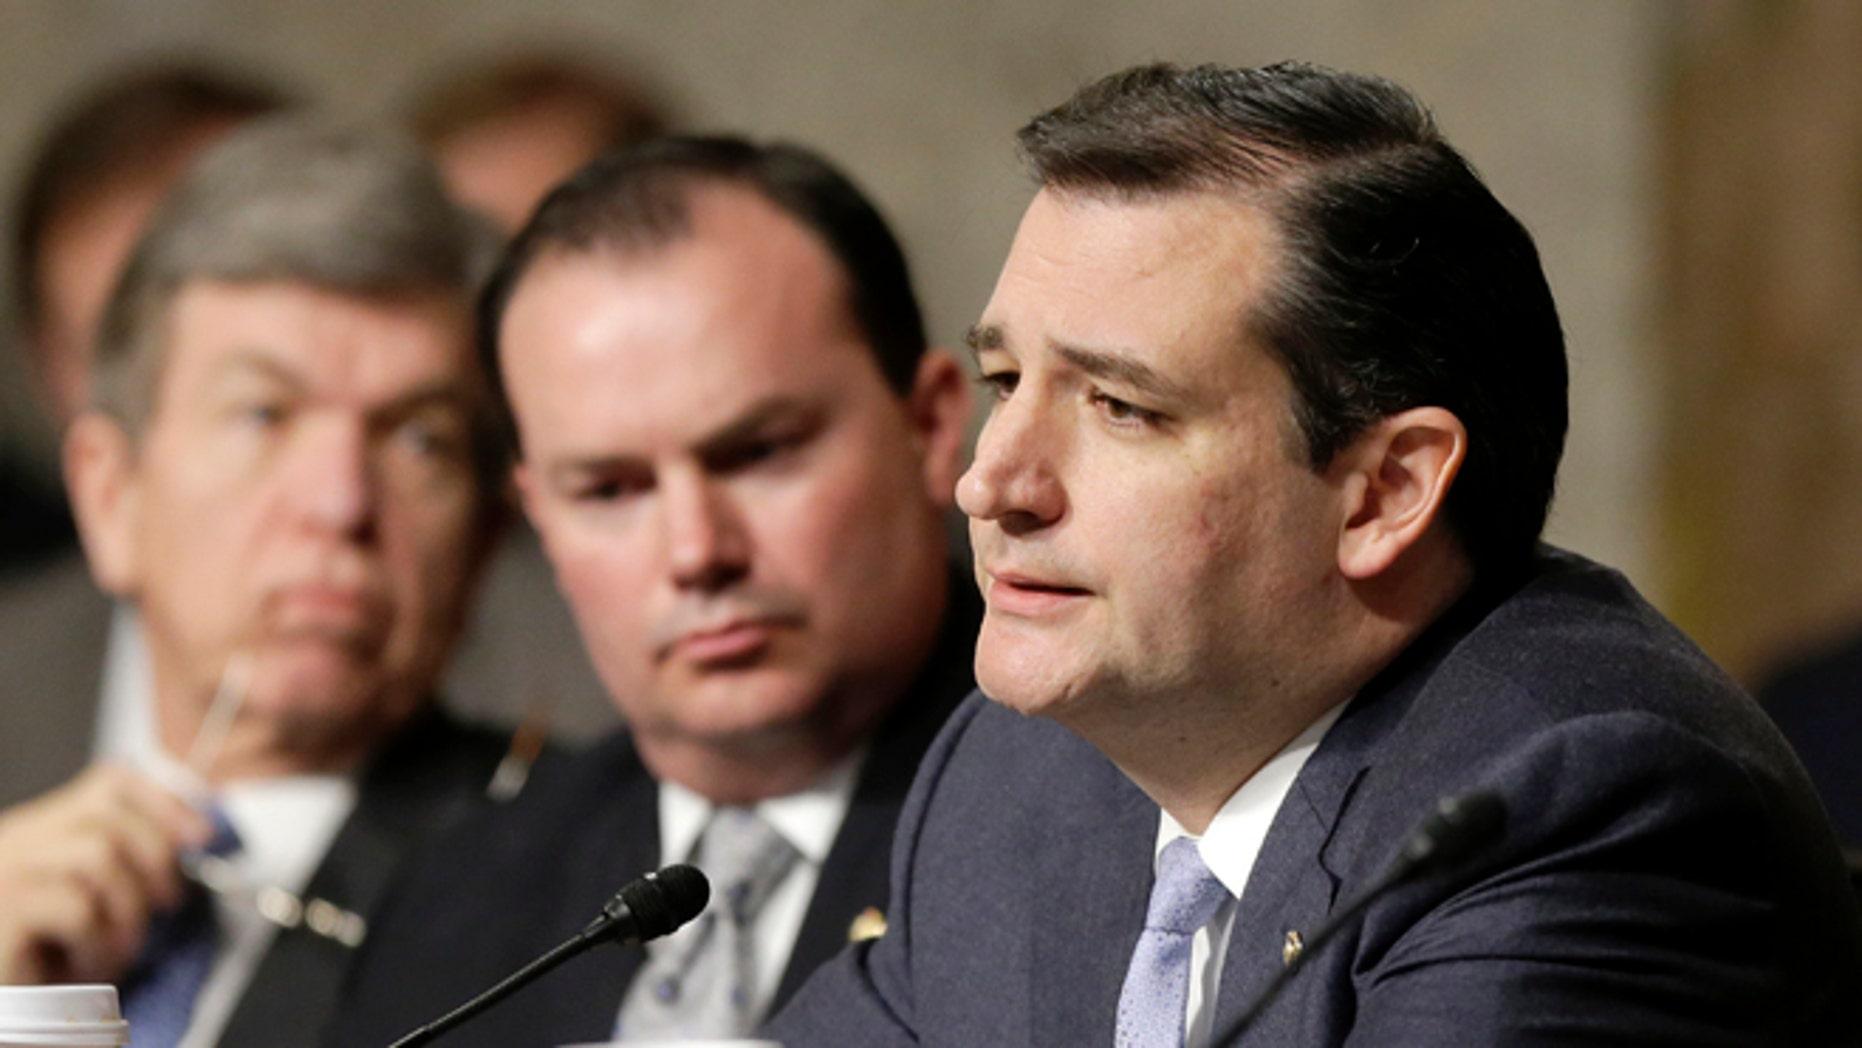 FILE: Jan. 31, 2013: Texas GOP Sen. Ted Cruz on Capitol Hill, in Washington, D.C.